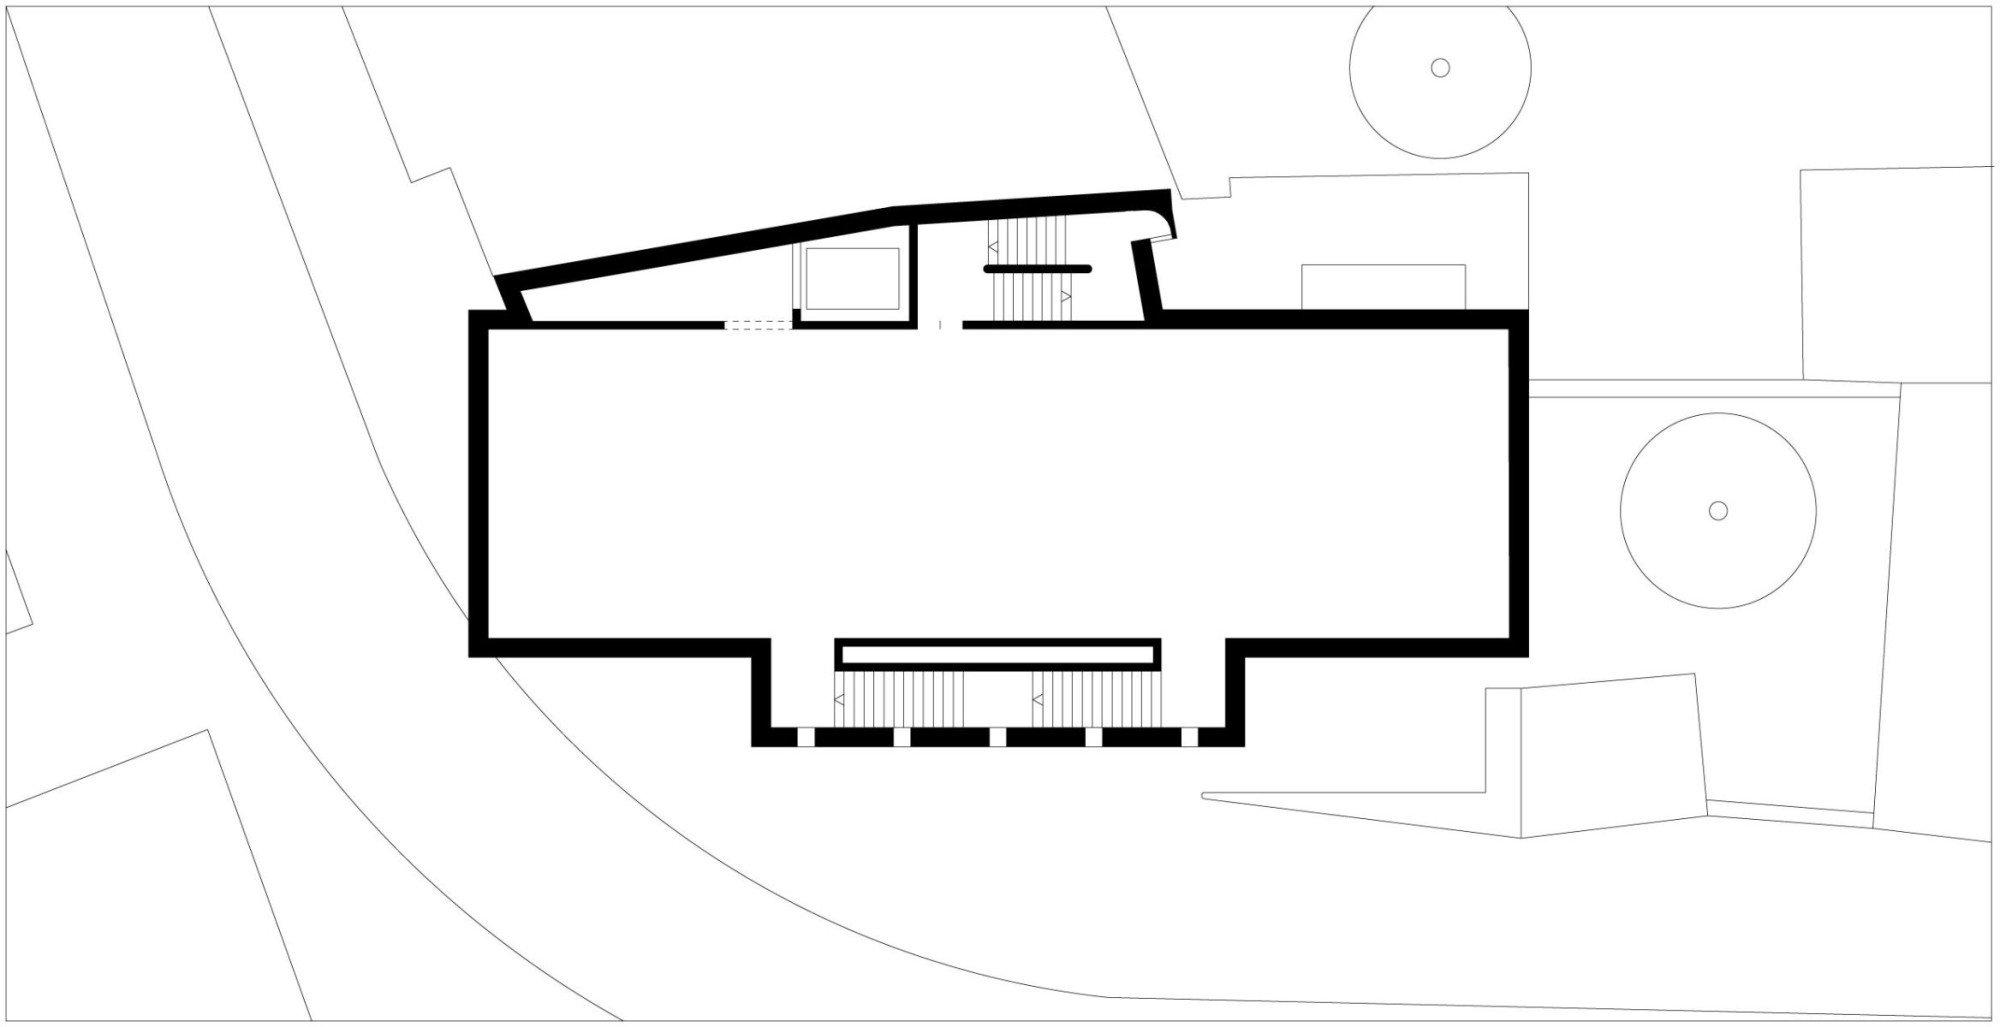 kunstmuseum in ravensburg heizung kultur bildung baunetz wissen. Black Bedroom Furniture Sets. Home Design Ideas